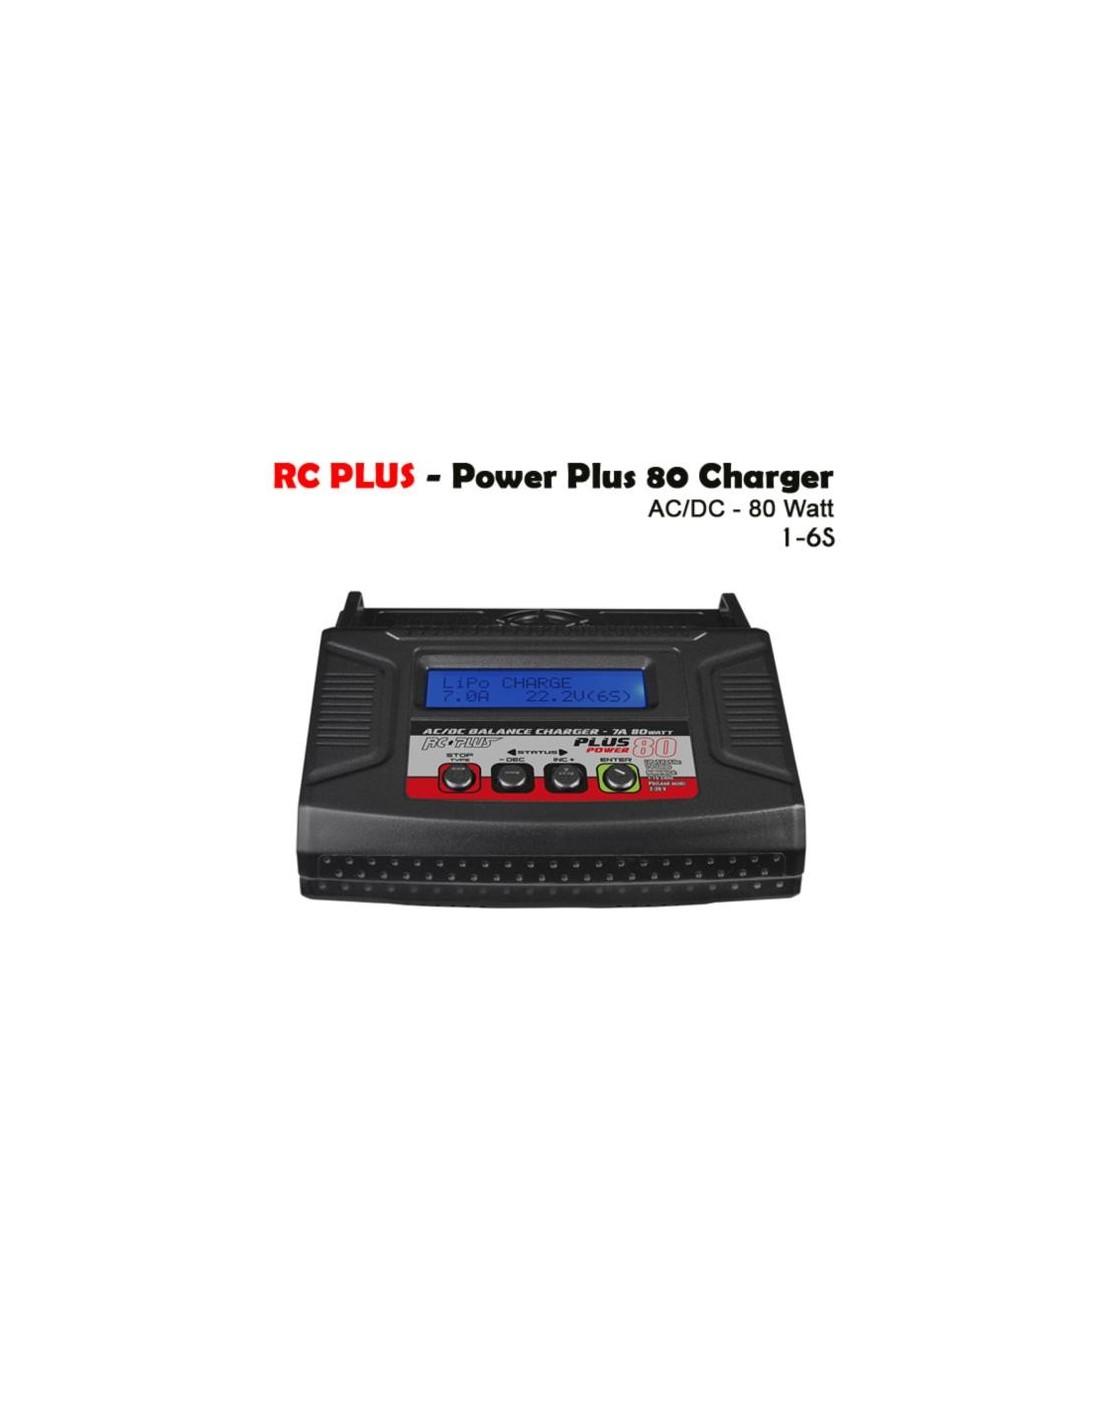 Rc Plus - Power Plus 80 Charger - AC-DC - 80 Watt